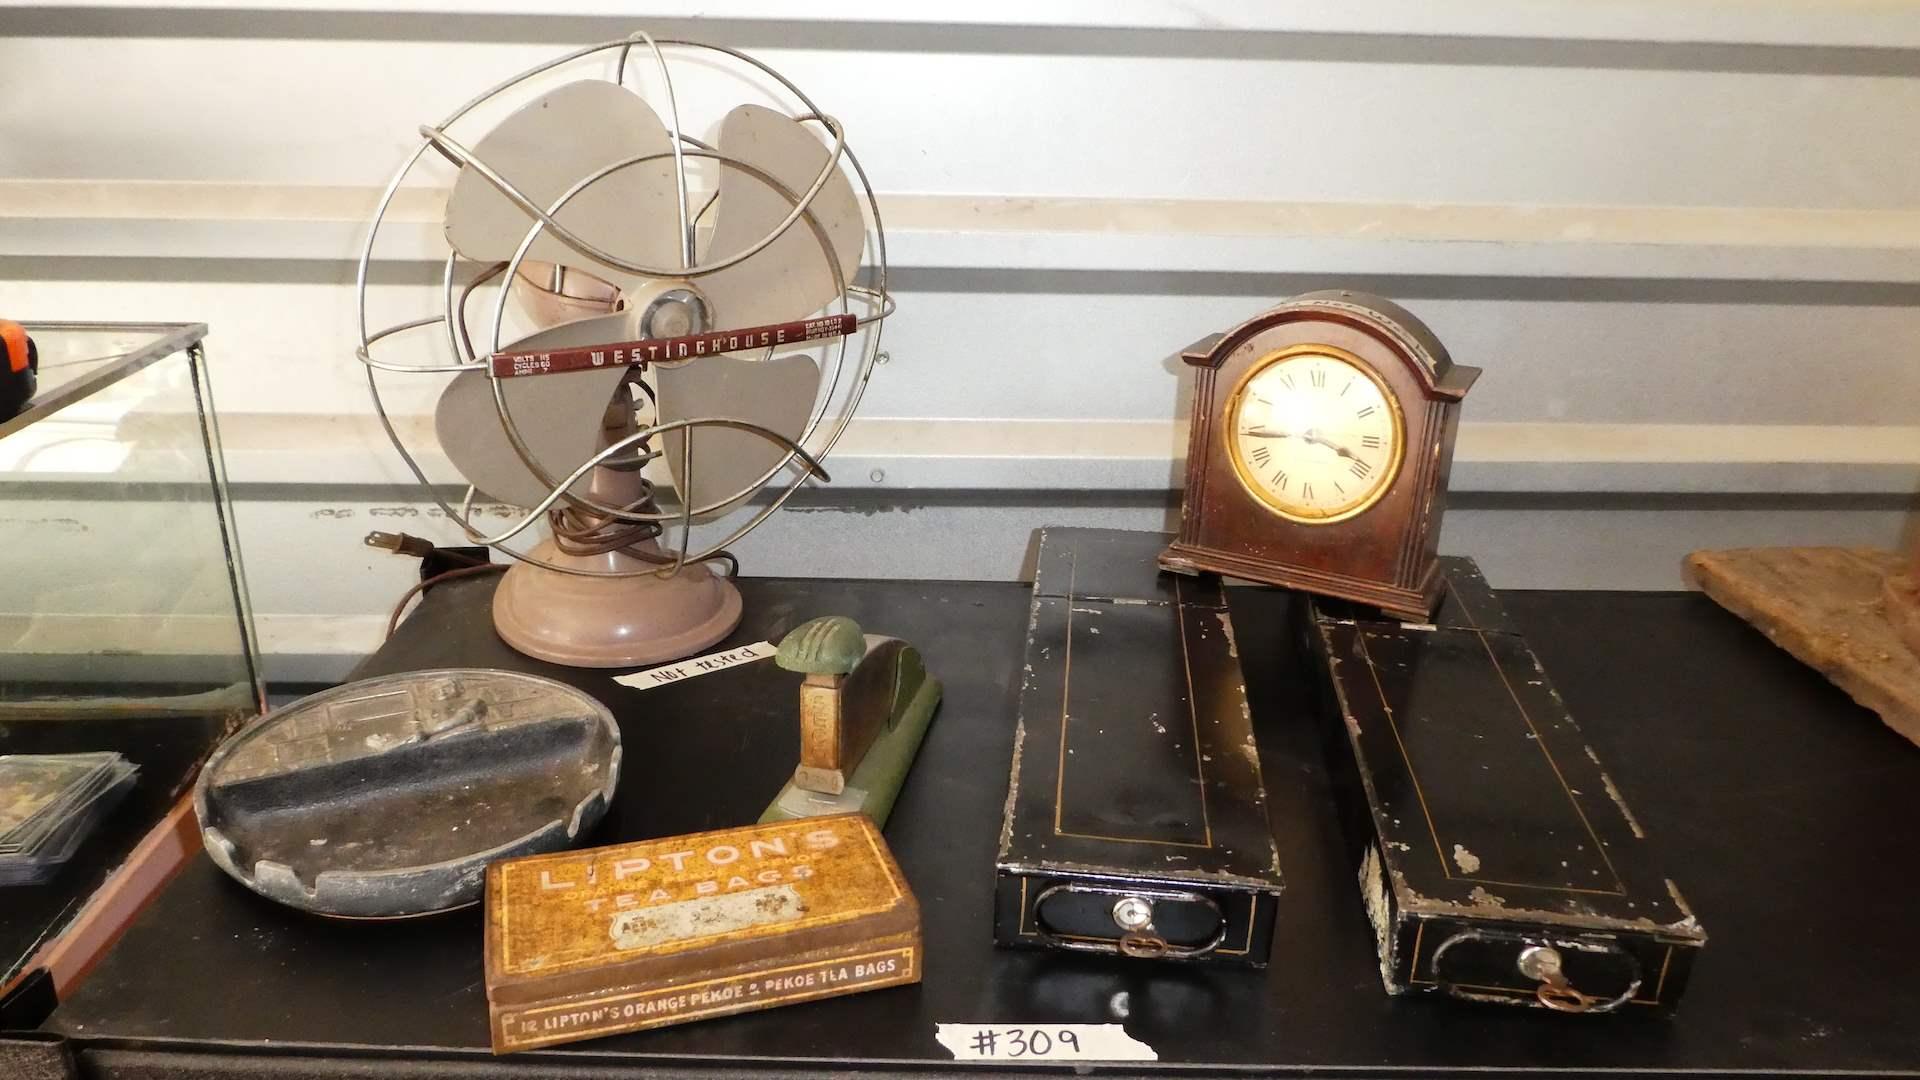 Lot # 309 - Vintage Collectors Lot(Vintage Metal Safety Deposit Boxes, Fan, Stapler, Clock & Metal Lipton Tea Box) (main image)